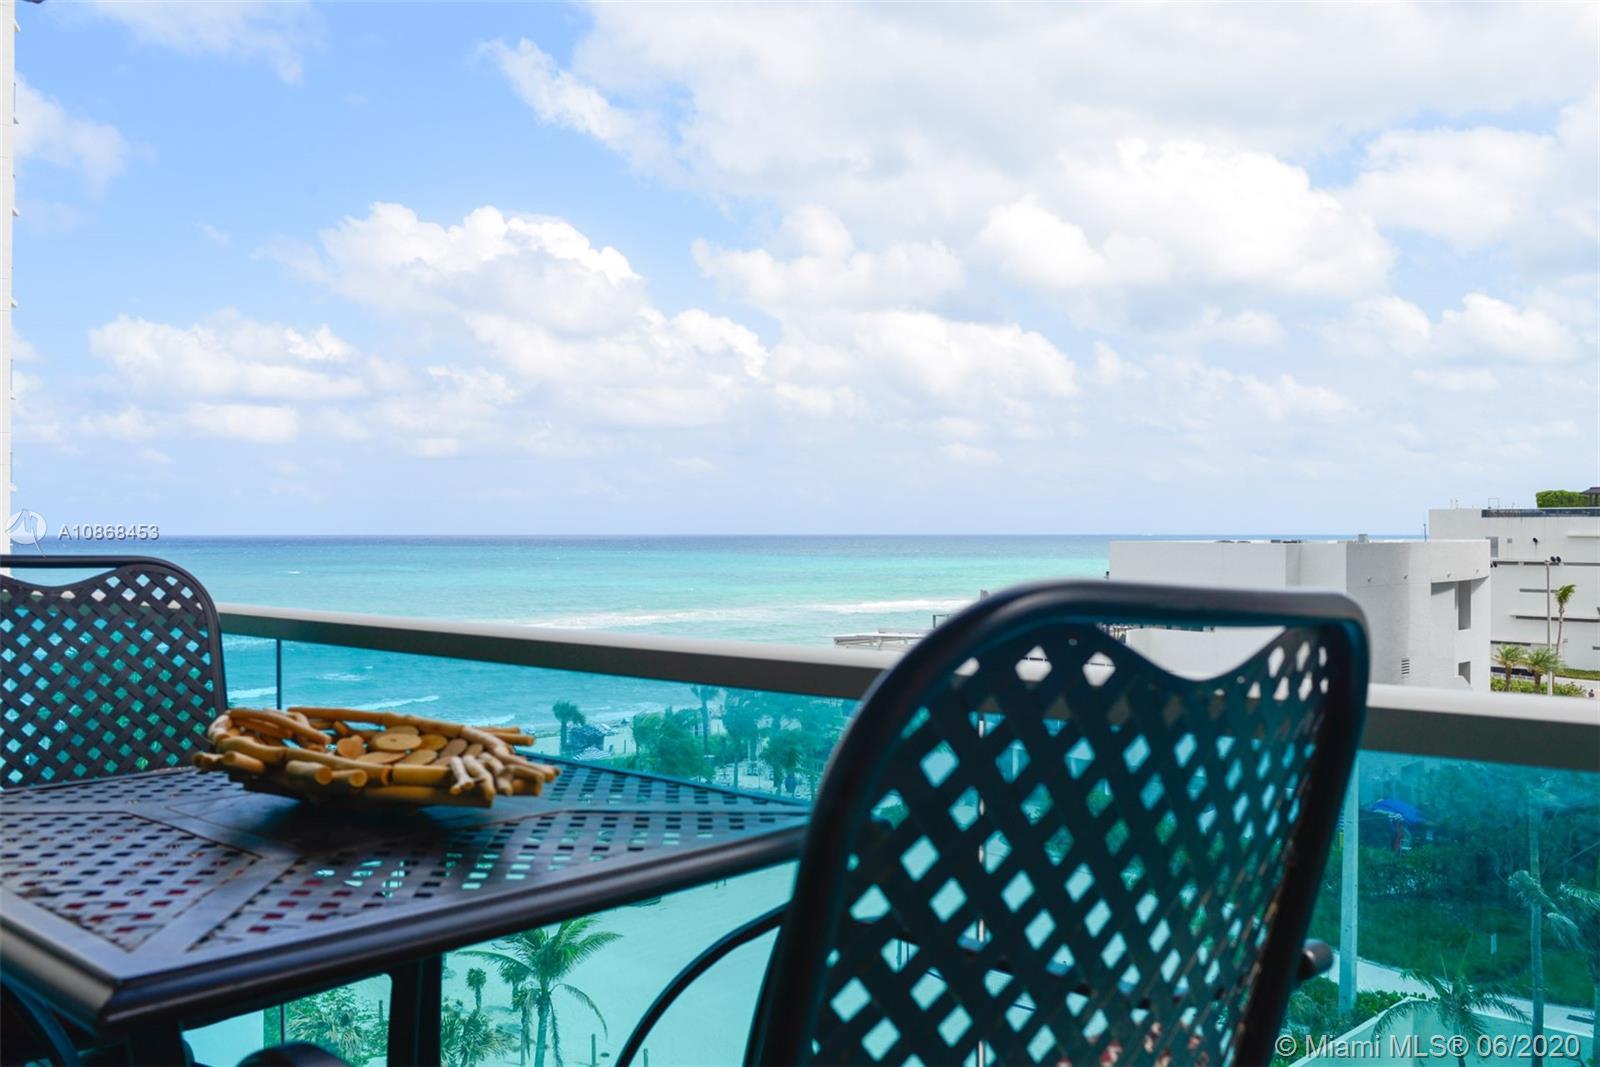 Sian Ocean Residences #6R - 4001 S Ocean Dr #6R, Hollywood, FL 33019